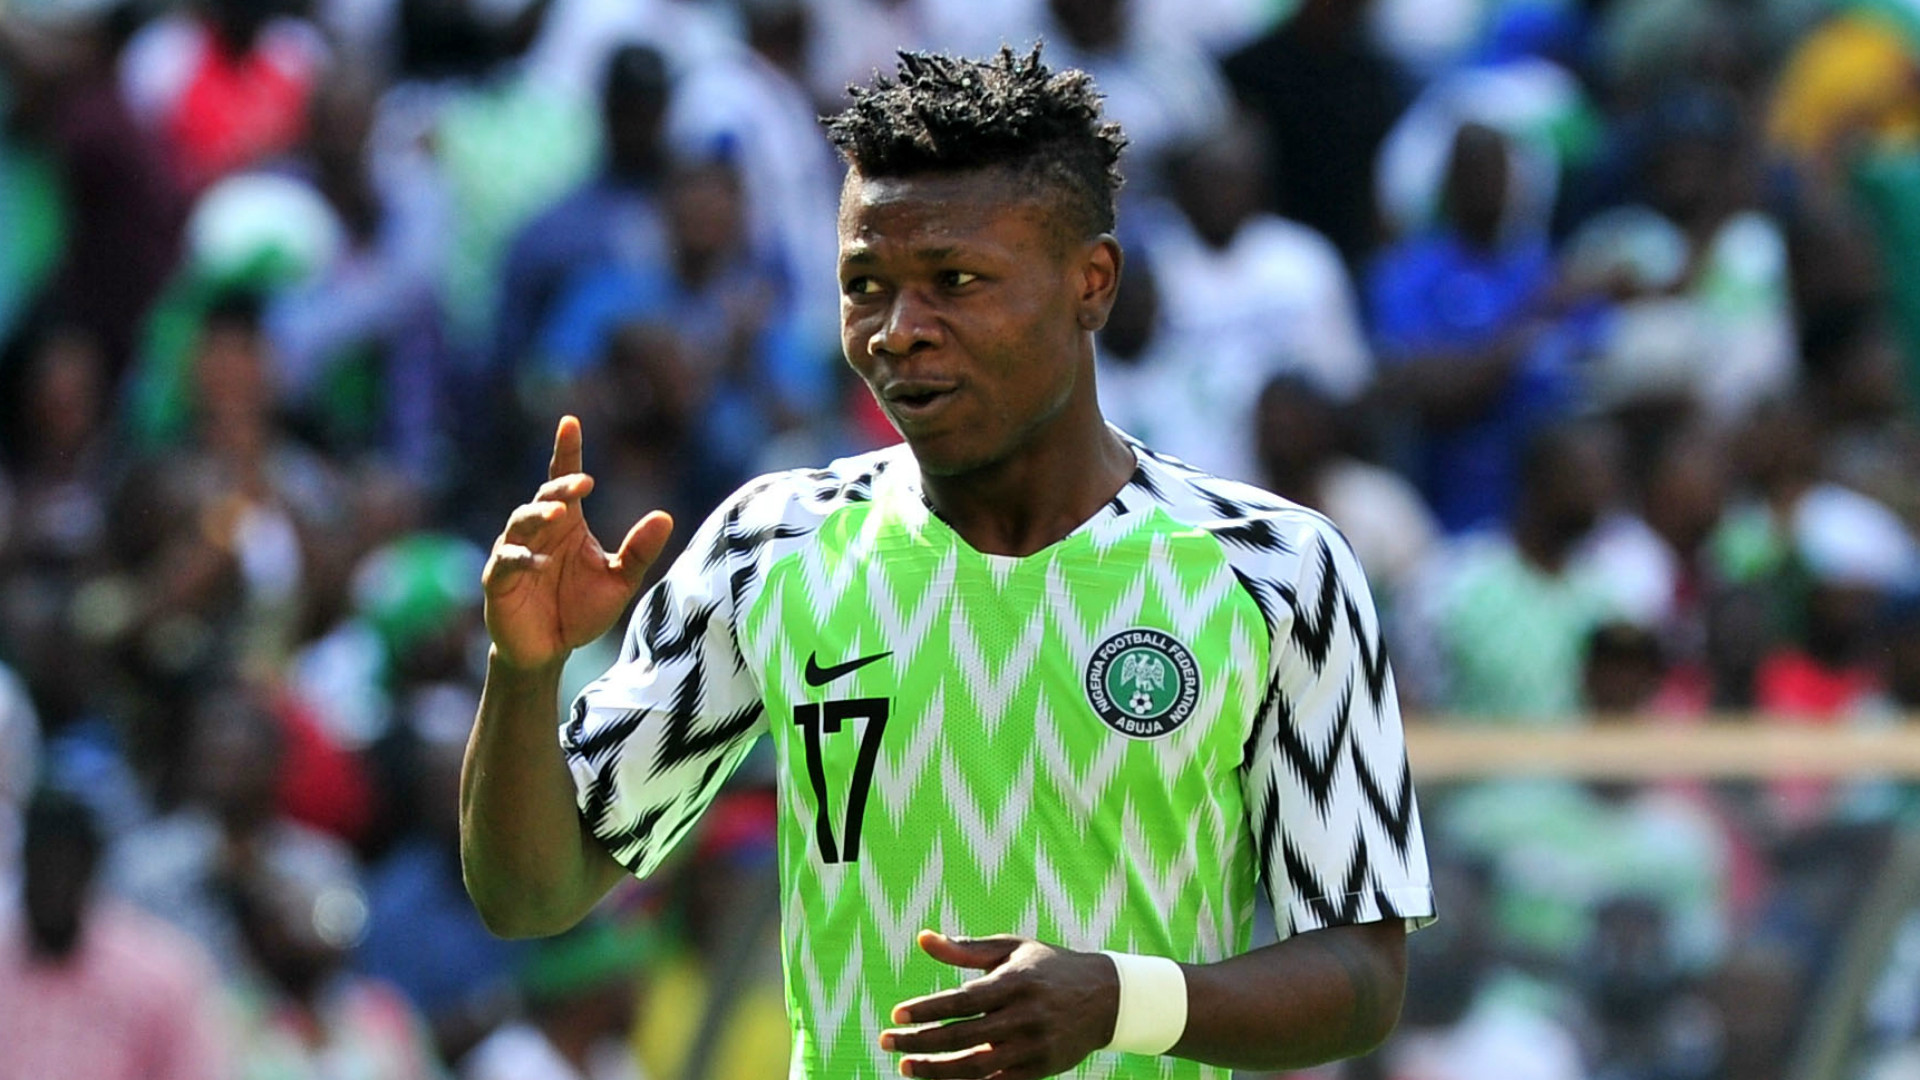 Super Eagles player, Samuel Kalu tests positive for Coronavirus